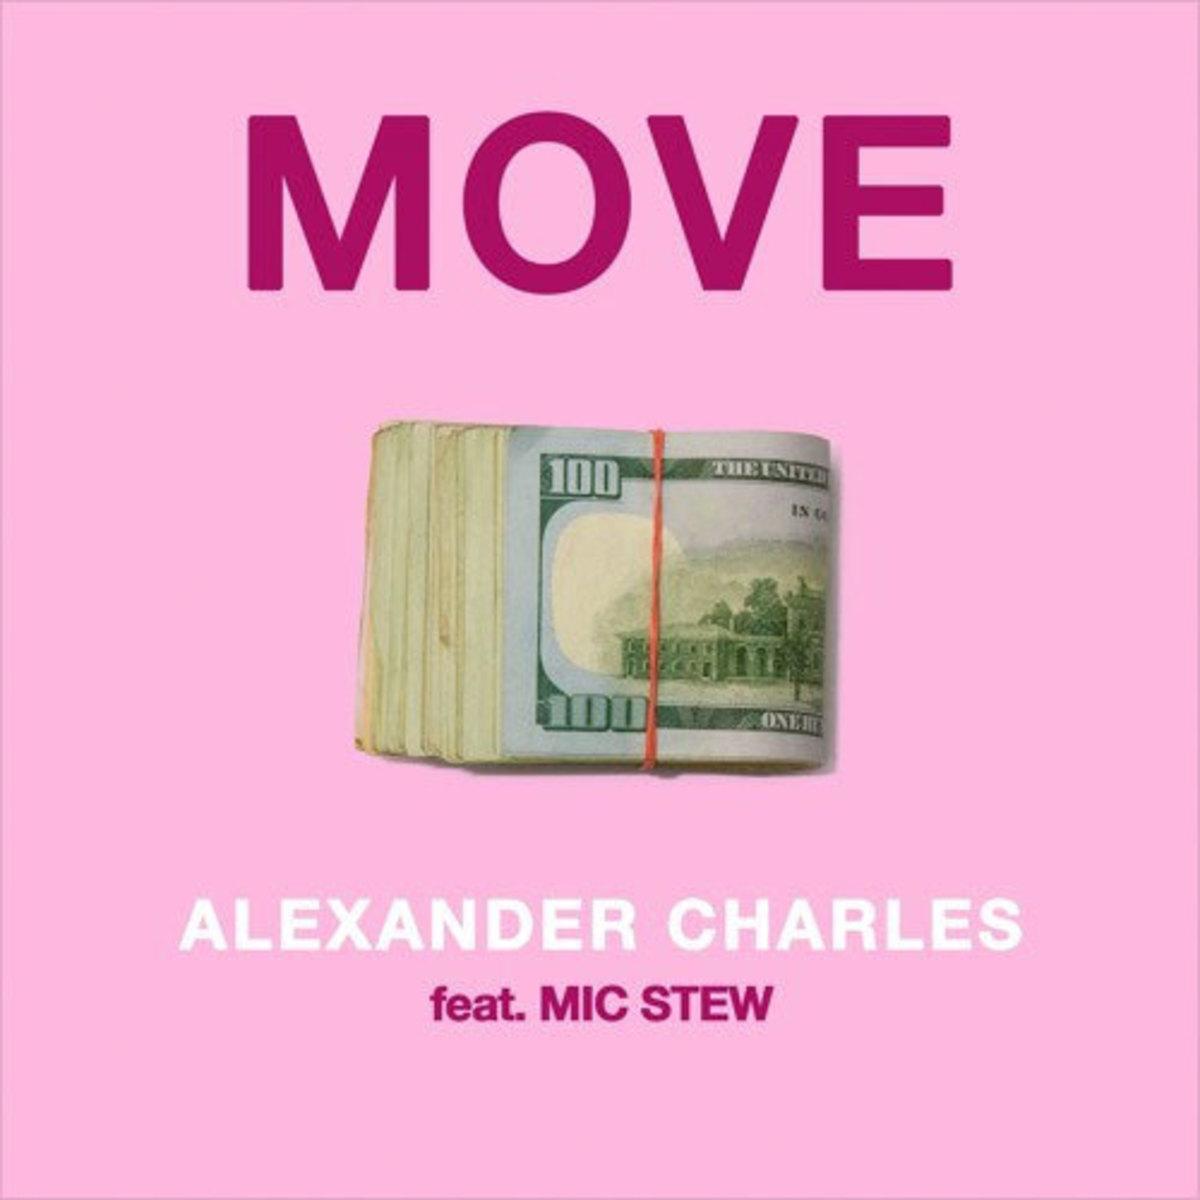 alexander-charles-move.jpg